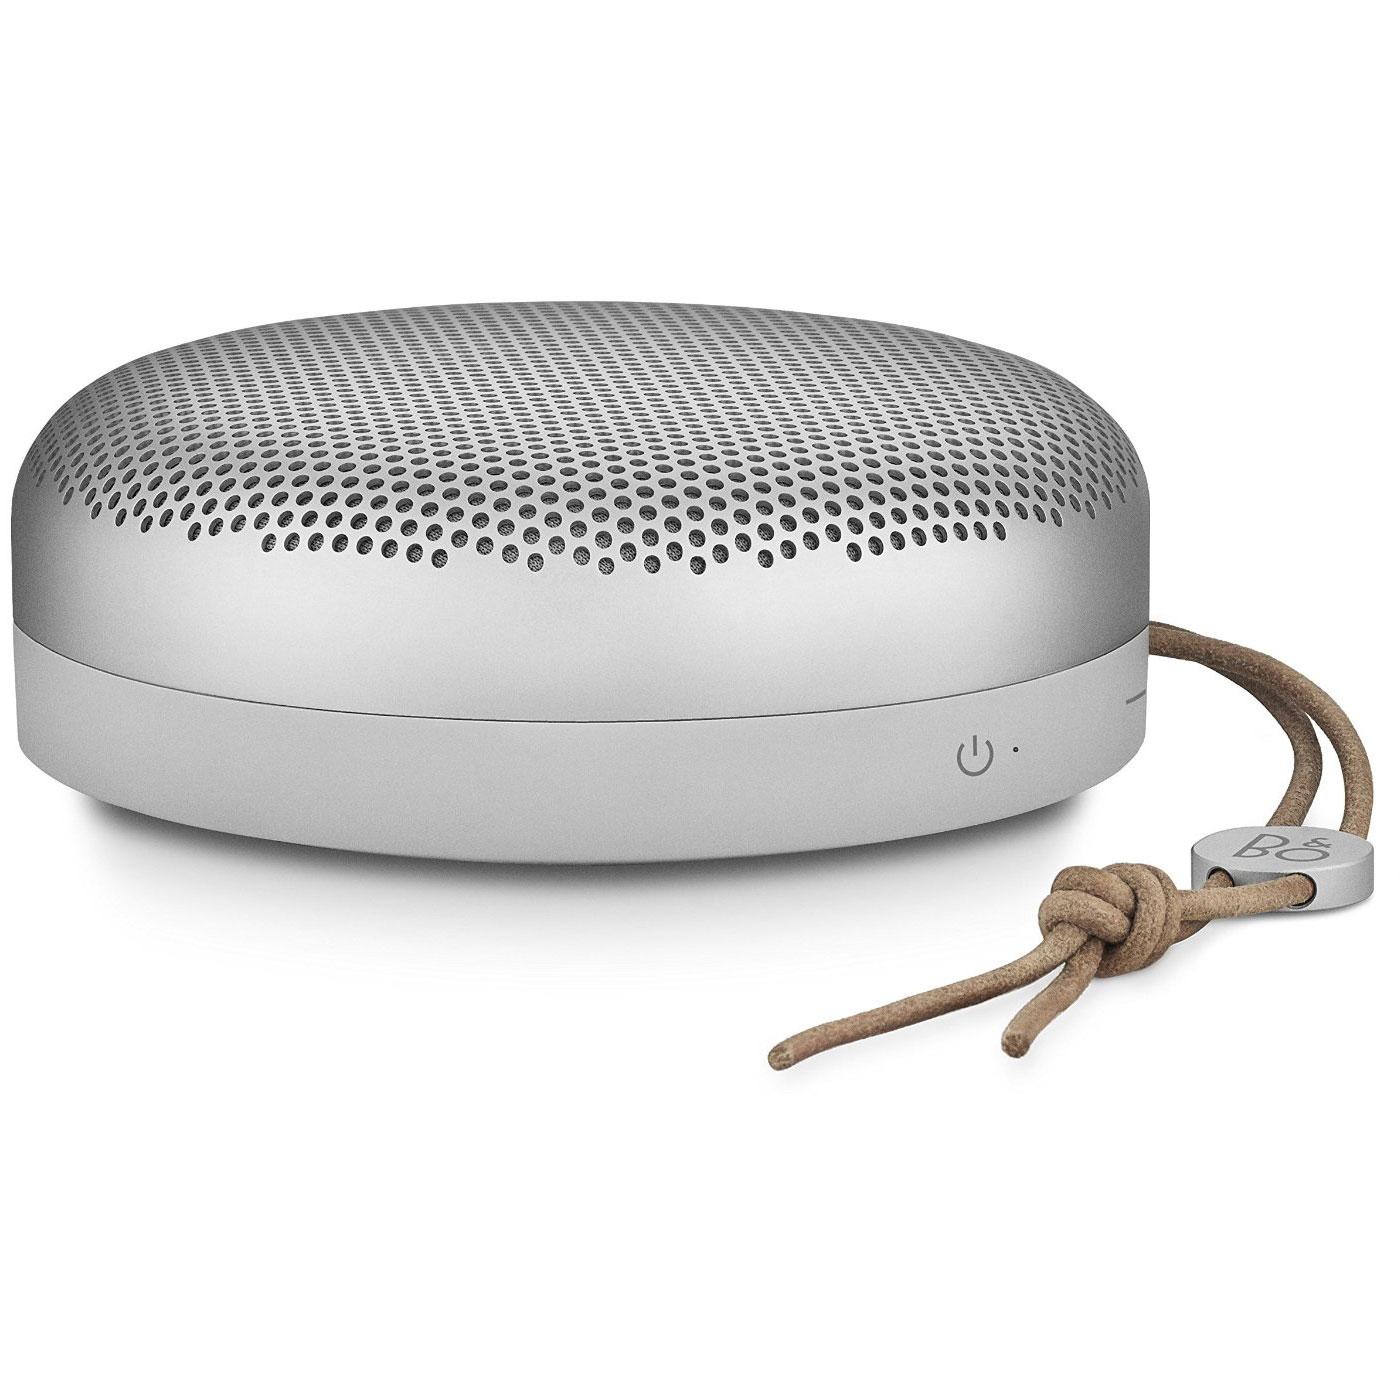 Dock & Enceinte Bluetooth Bang & Olufsen Beoplay A1 Naturel Enceinte stéréo Bluetooth portable (2 x 30 W)